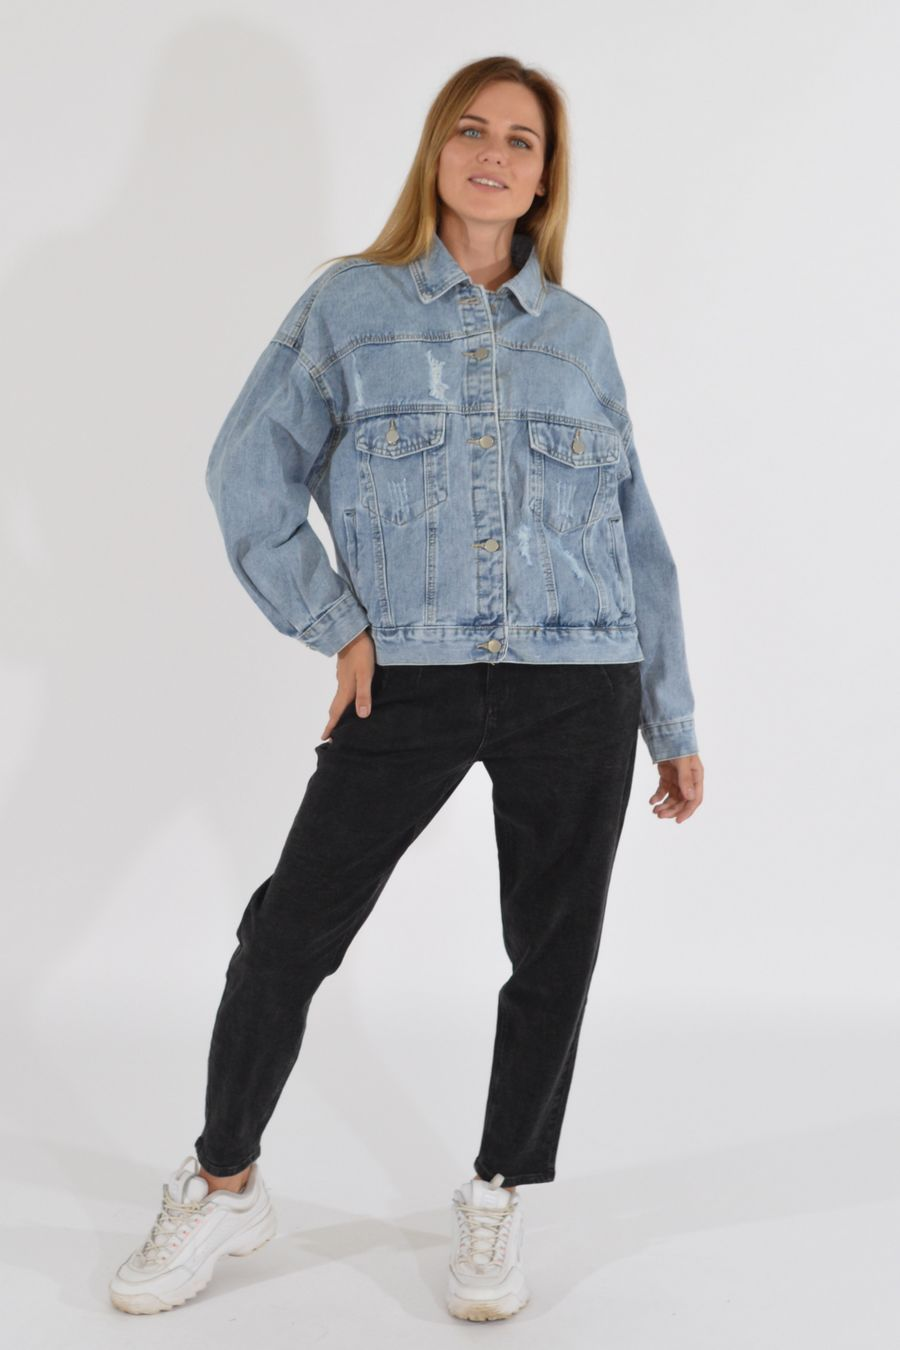 Жакет женский (джинсовка) LRZBS 2189 - фото 2